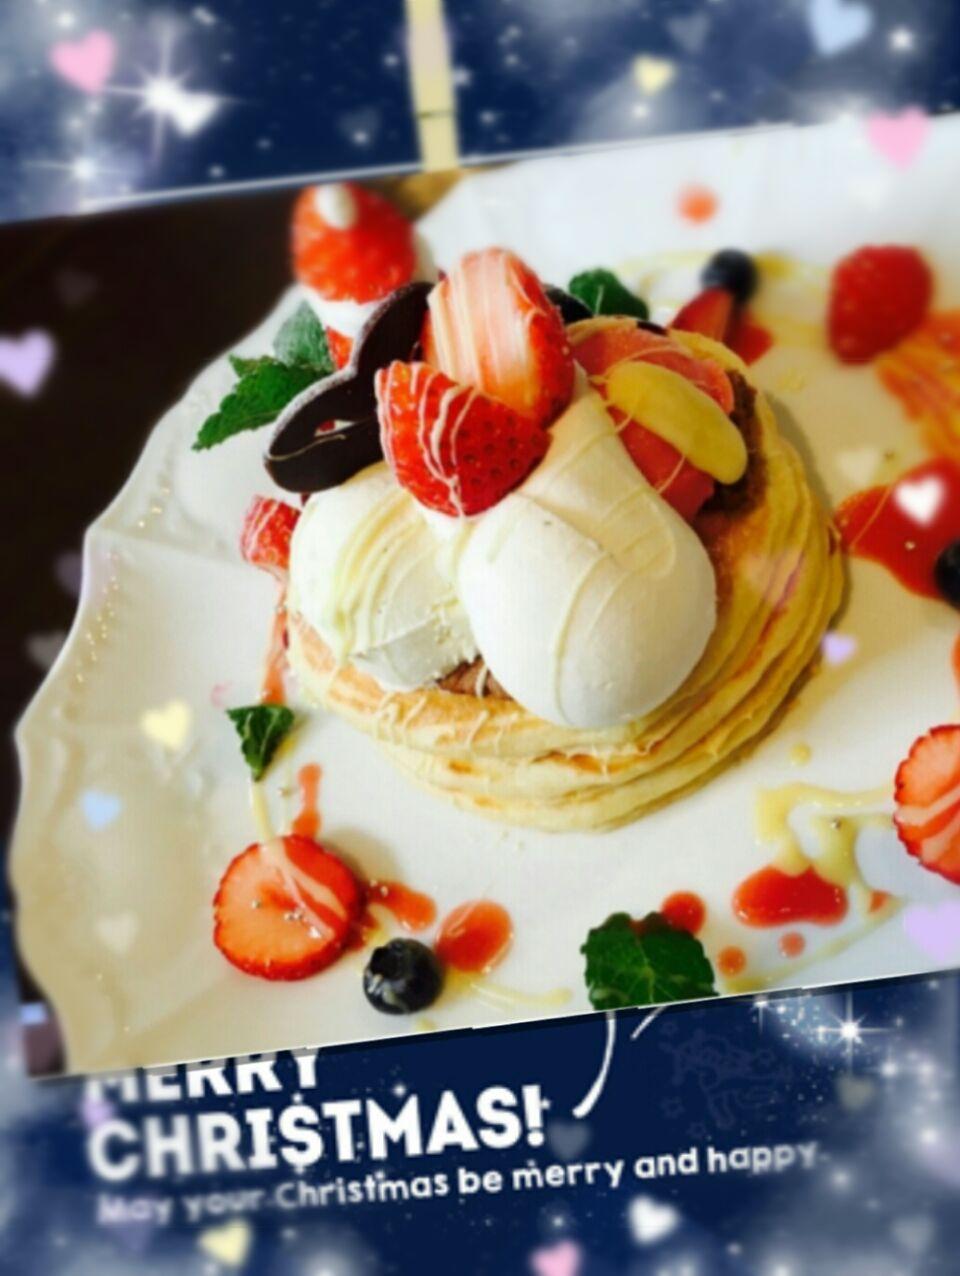 Merry Christmas♡゚ パンケーキで~           MerryX'mas♡゚